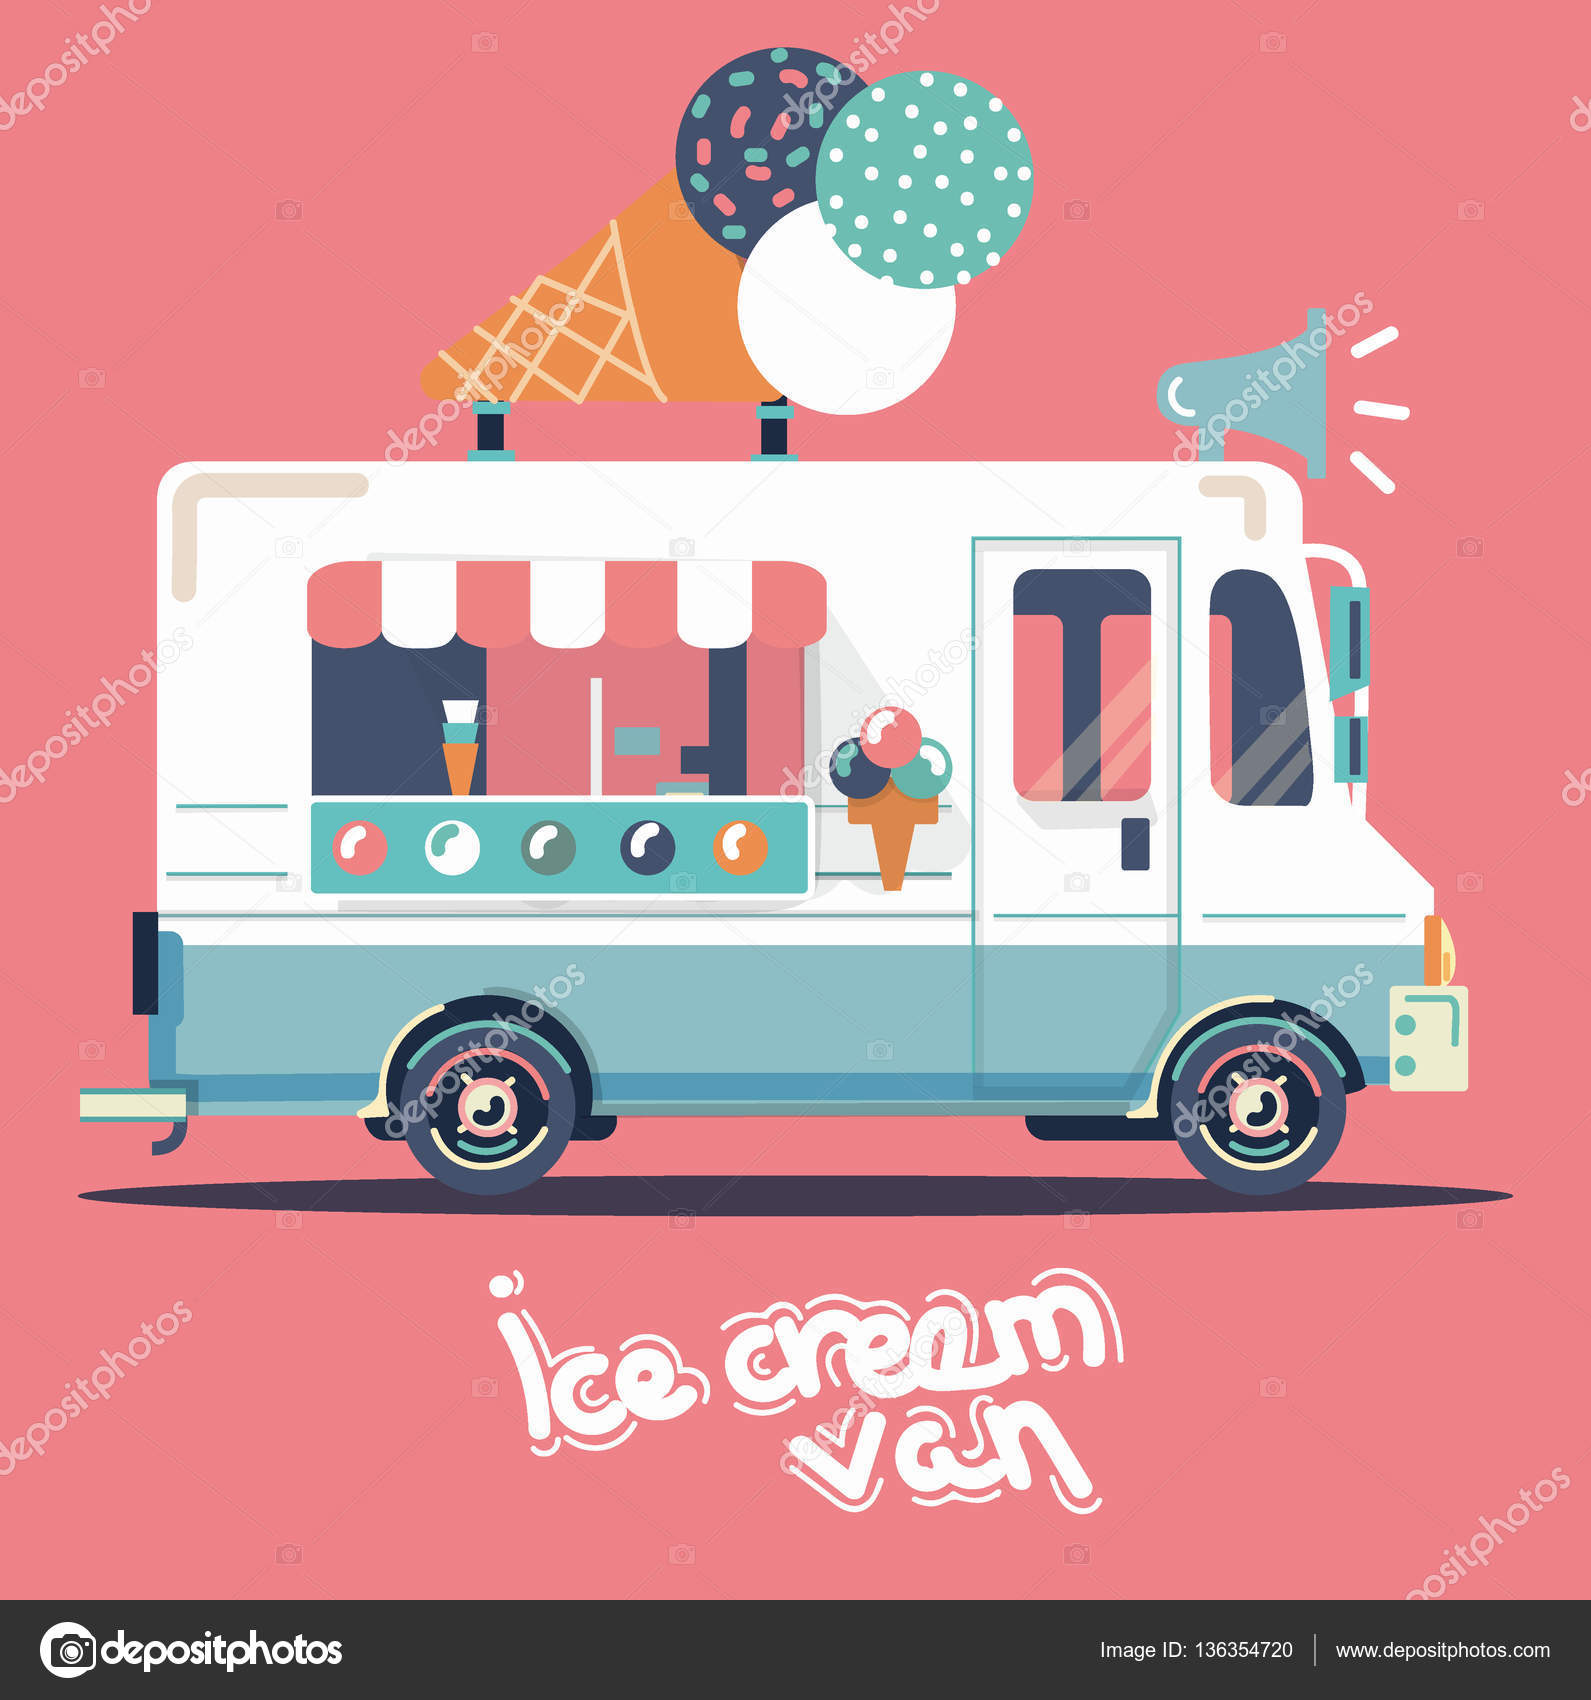 Vector Van Illustration Retro Vintage Ice Cream By 13margarita93gmail